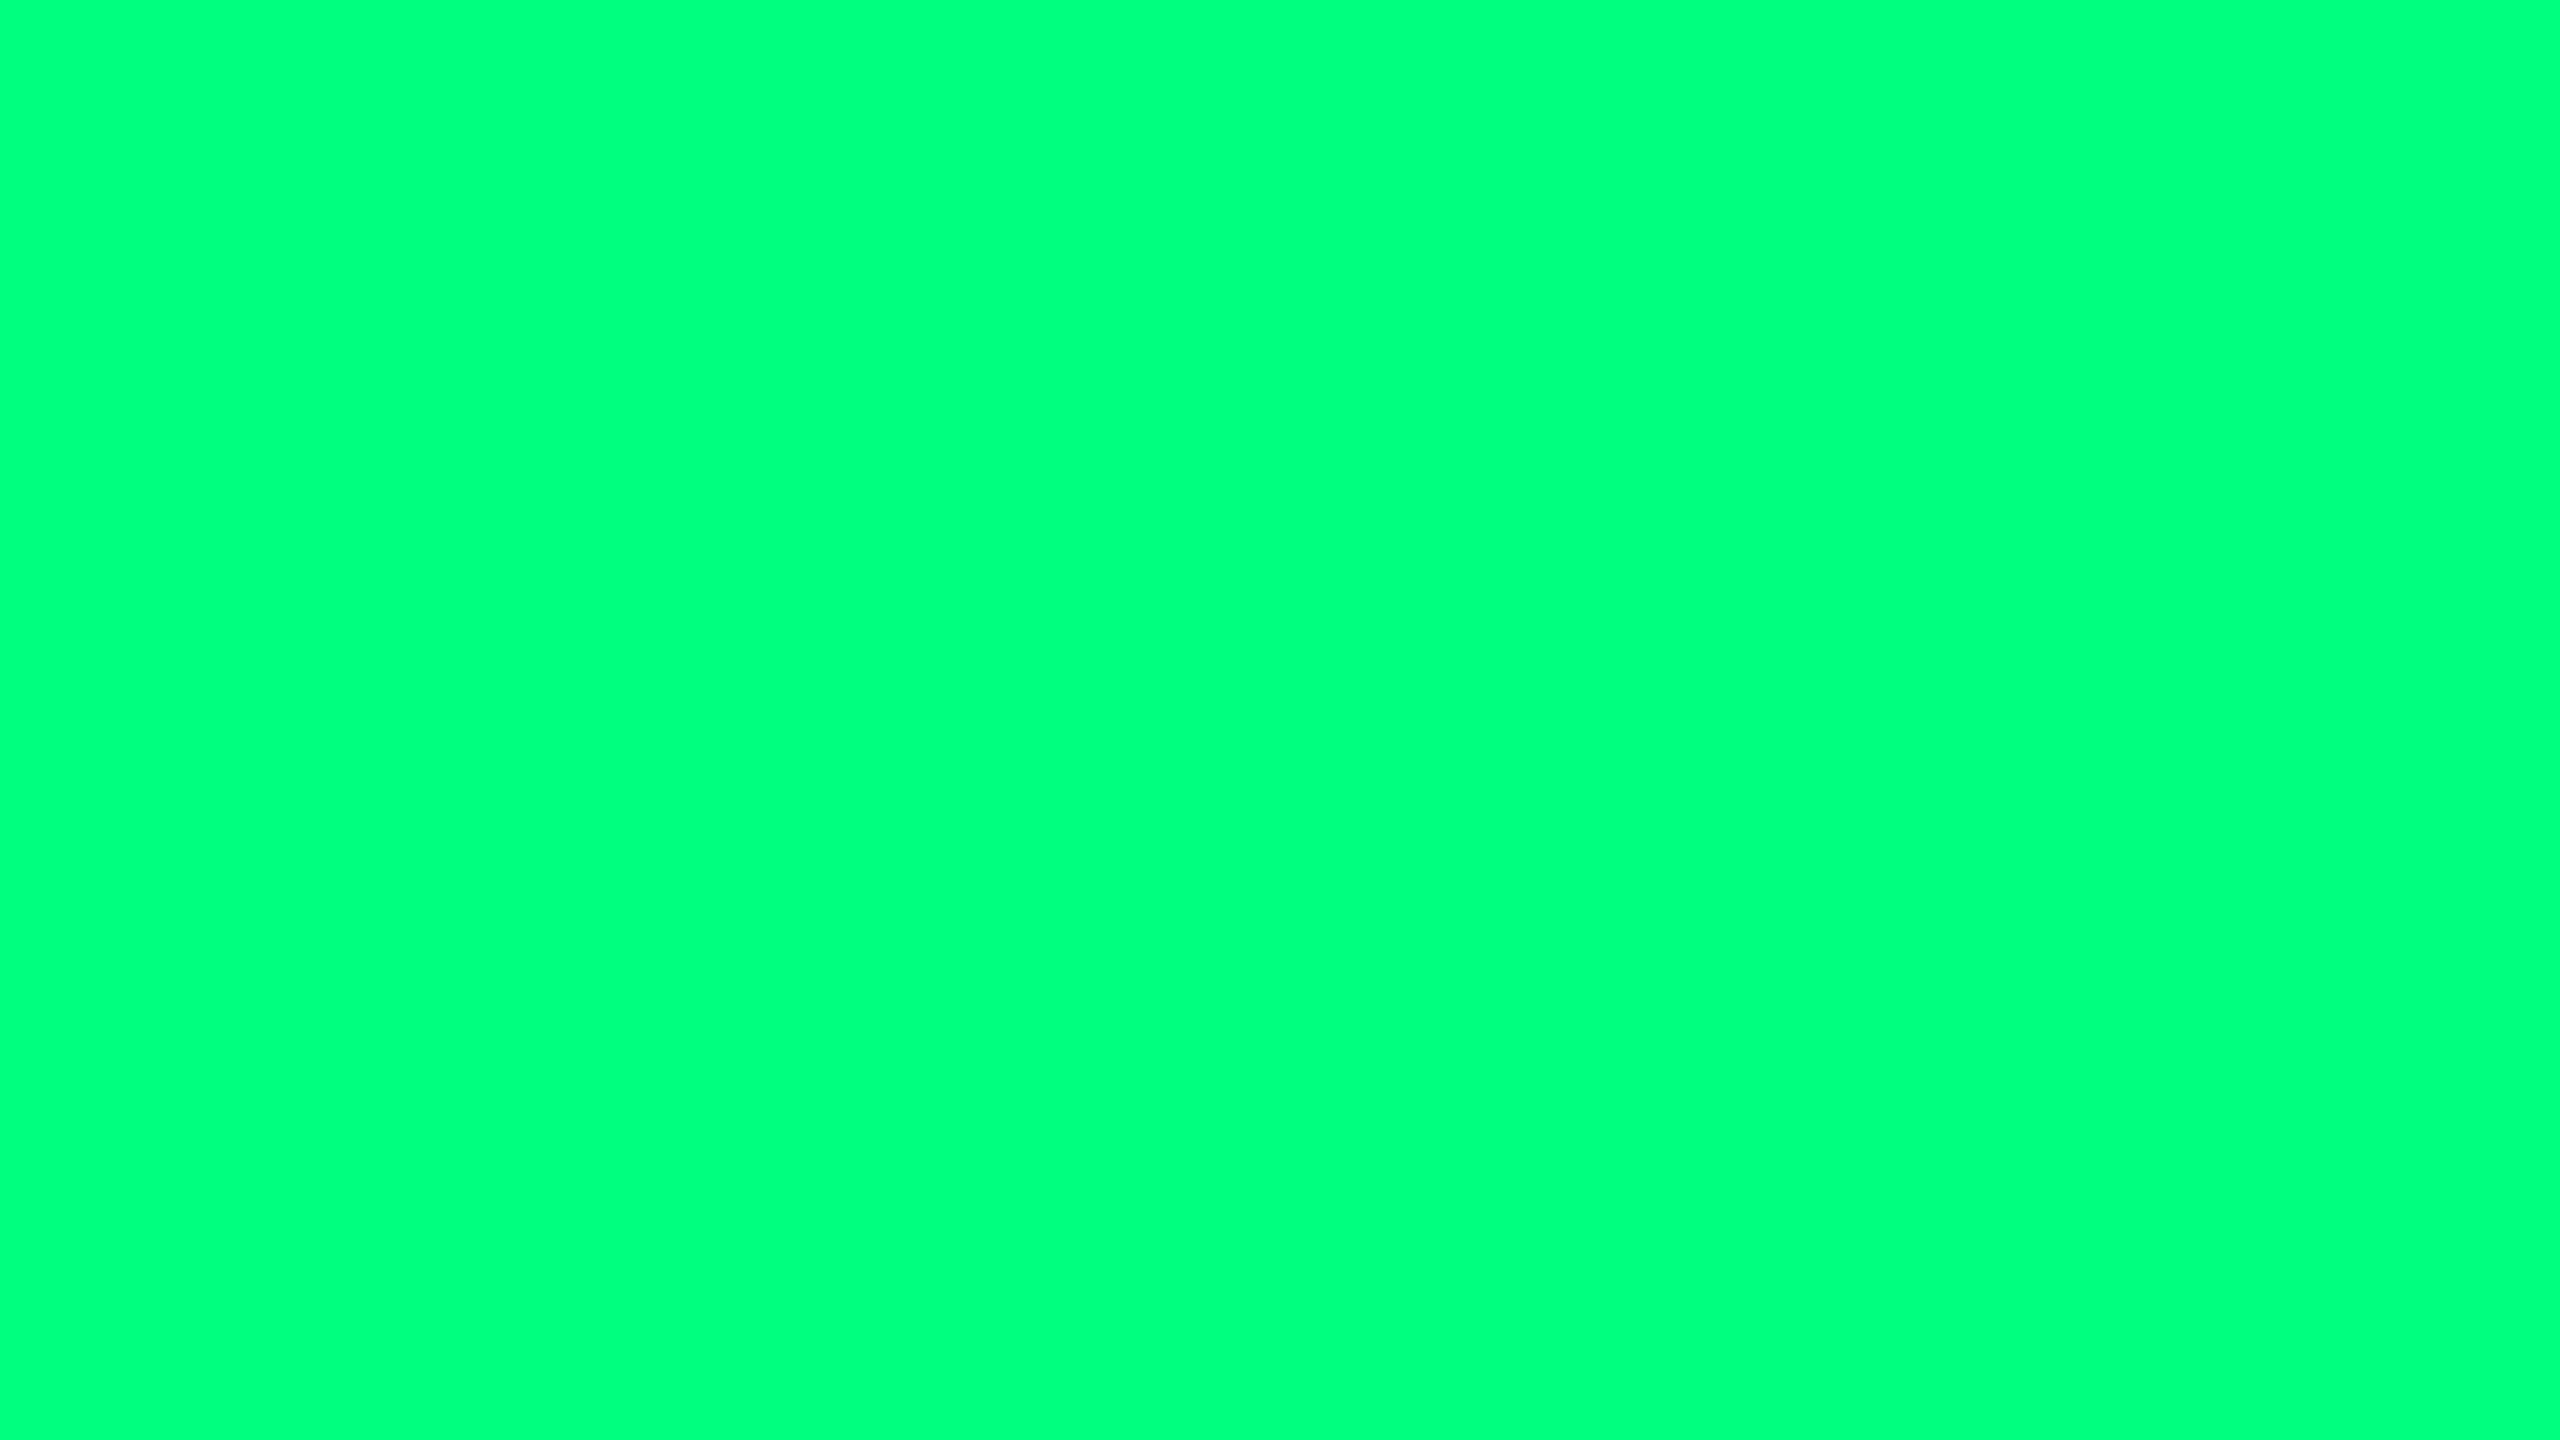 pacific rim wallpaper 2560x1440